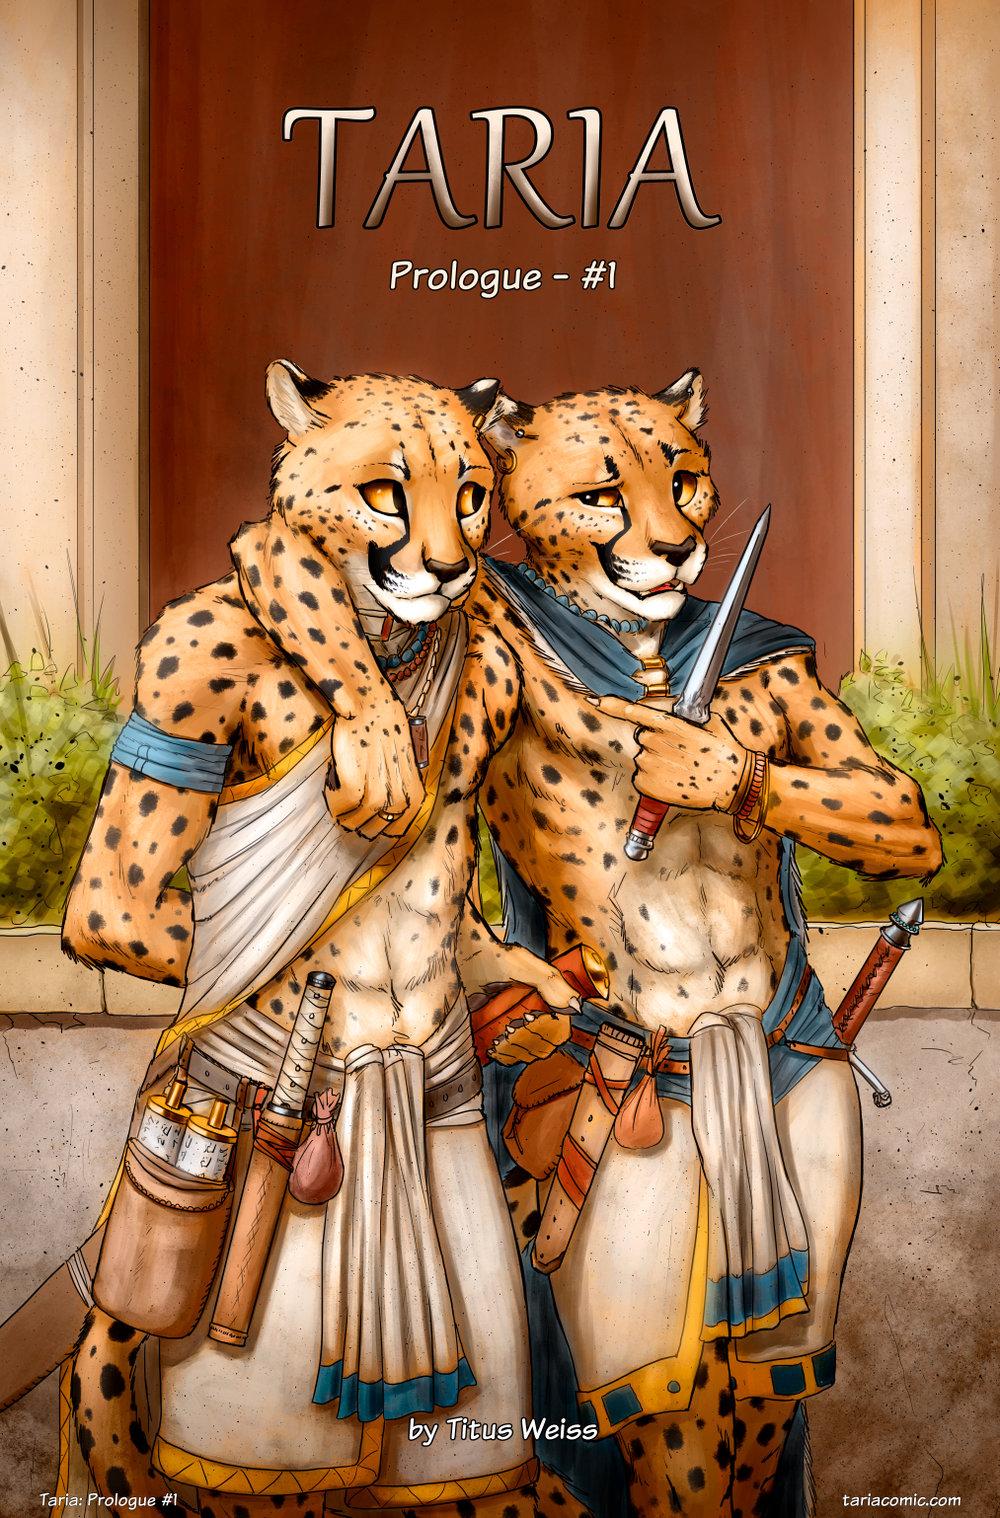 Taria_Prologue_#1 Cover sRGB.jpg